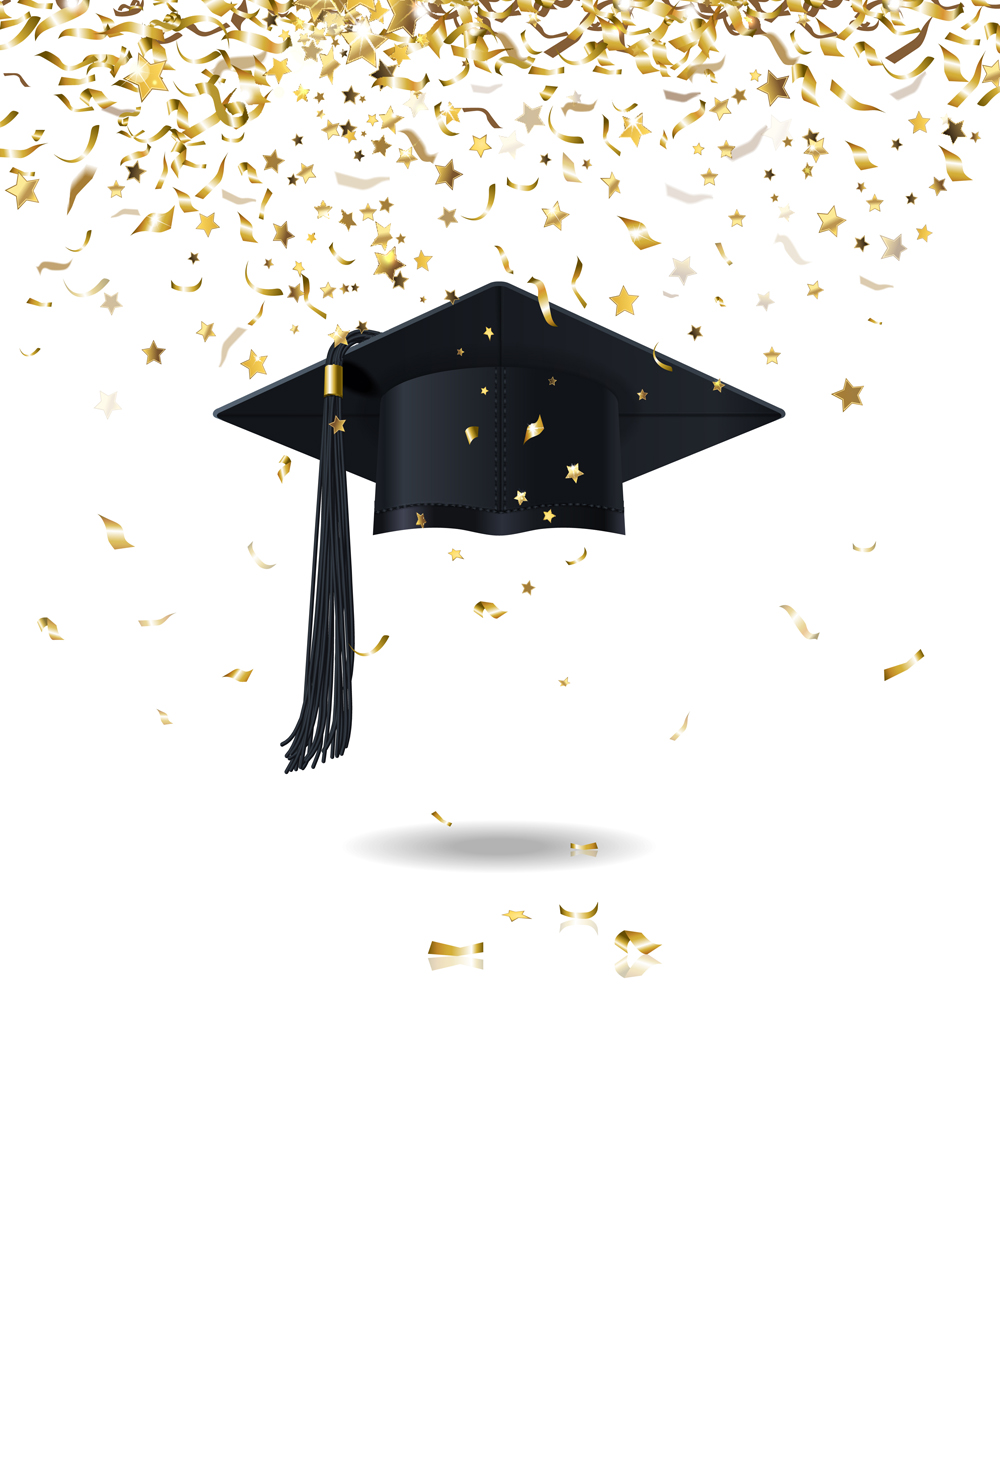 huayi 2018 graduation hat backdrops school students